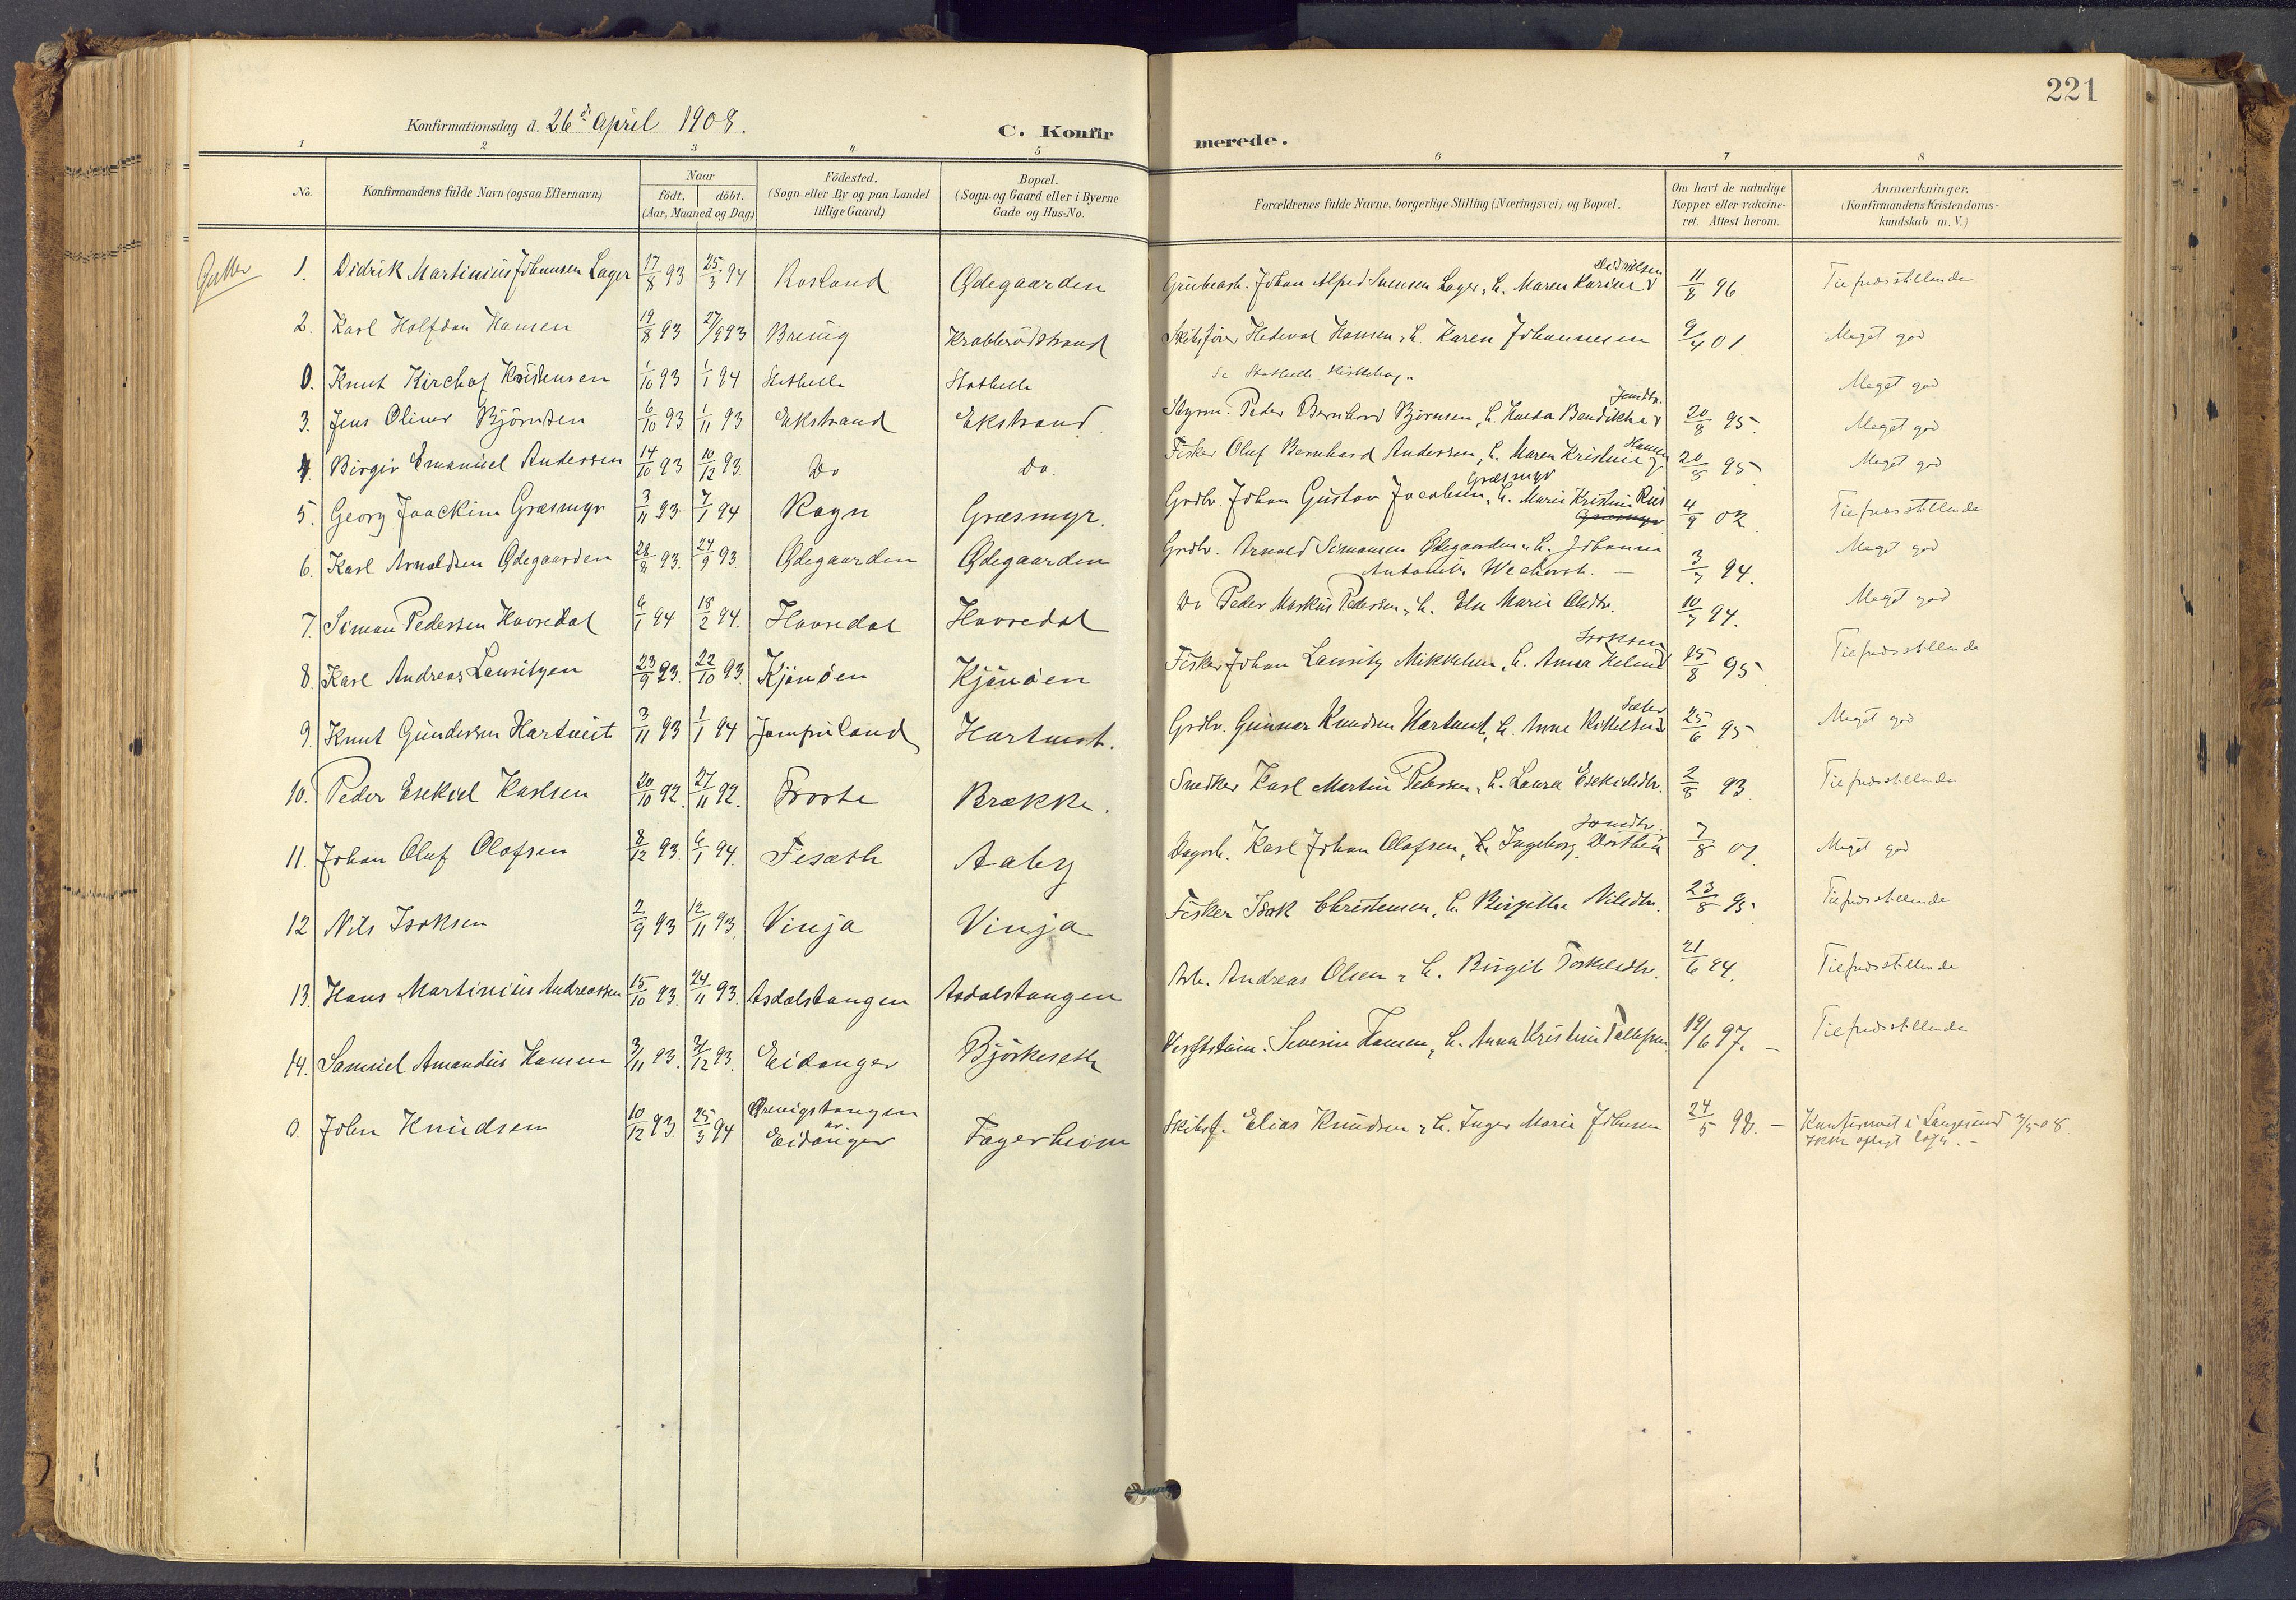 SAKO, Bamble kirkebøker, F/Fa/L0009: Ministerialbok nr. I 9, 1901-1917, s. 221